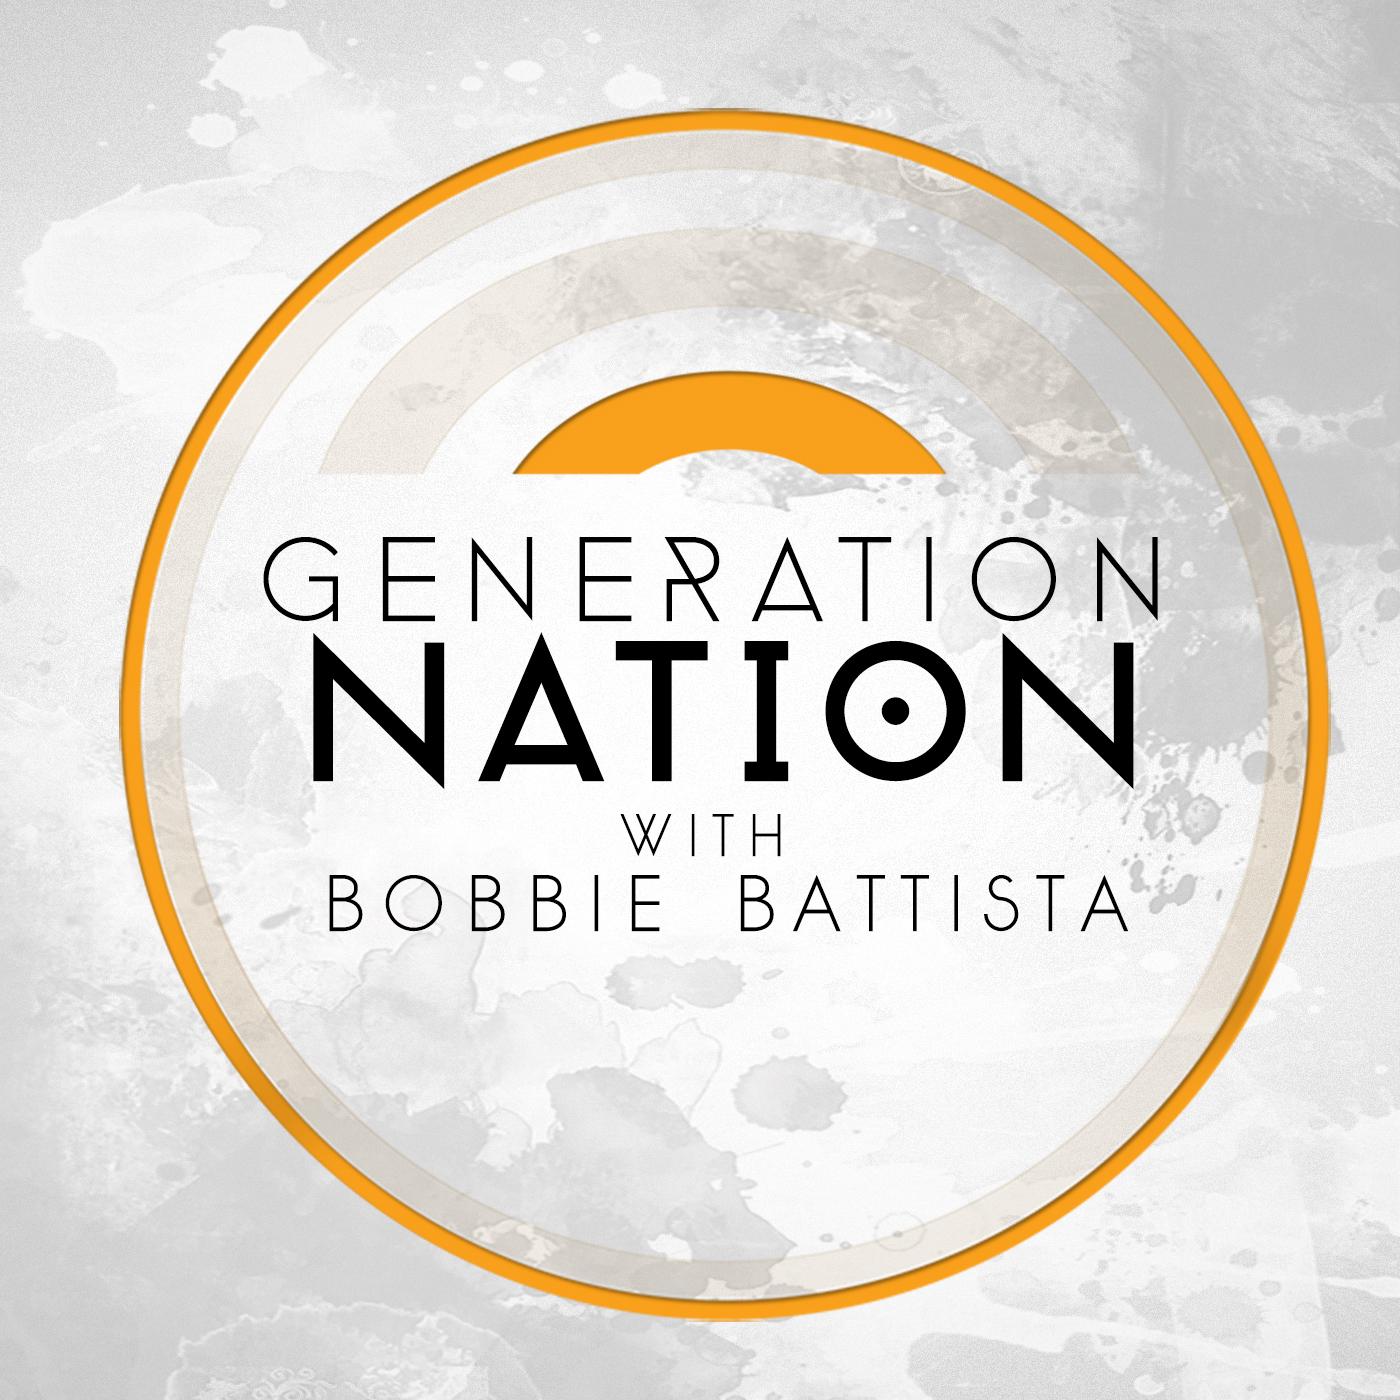 Generation Nation